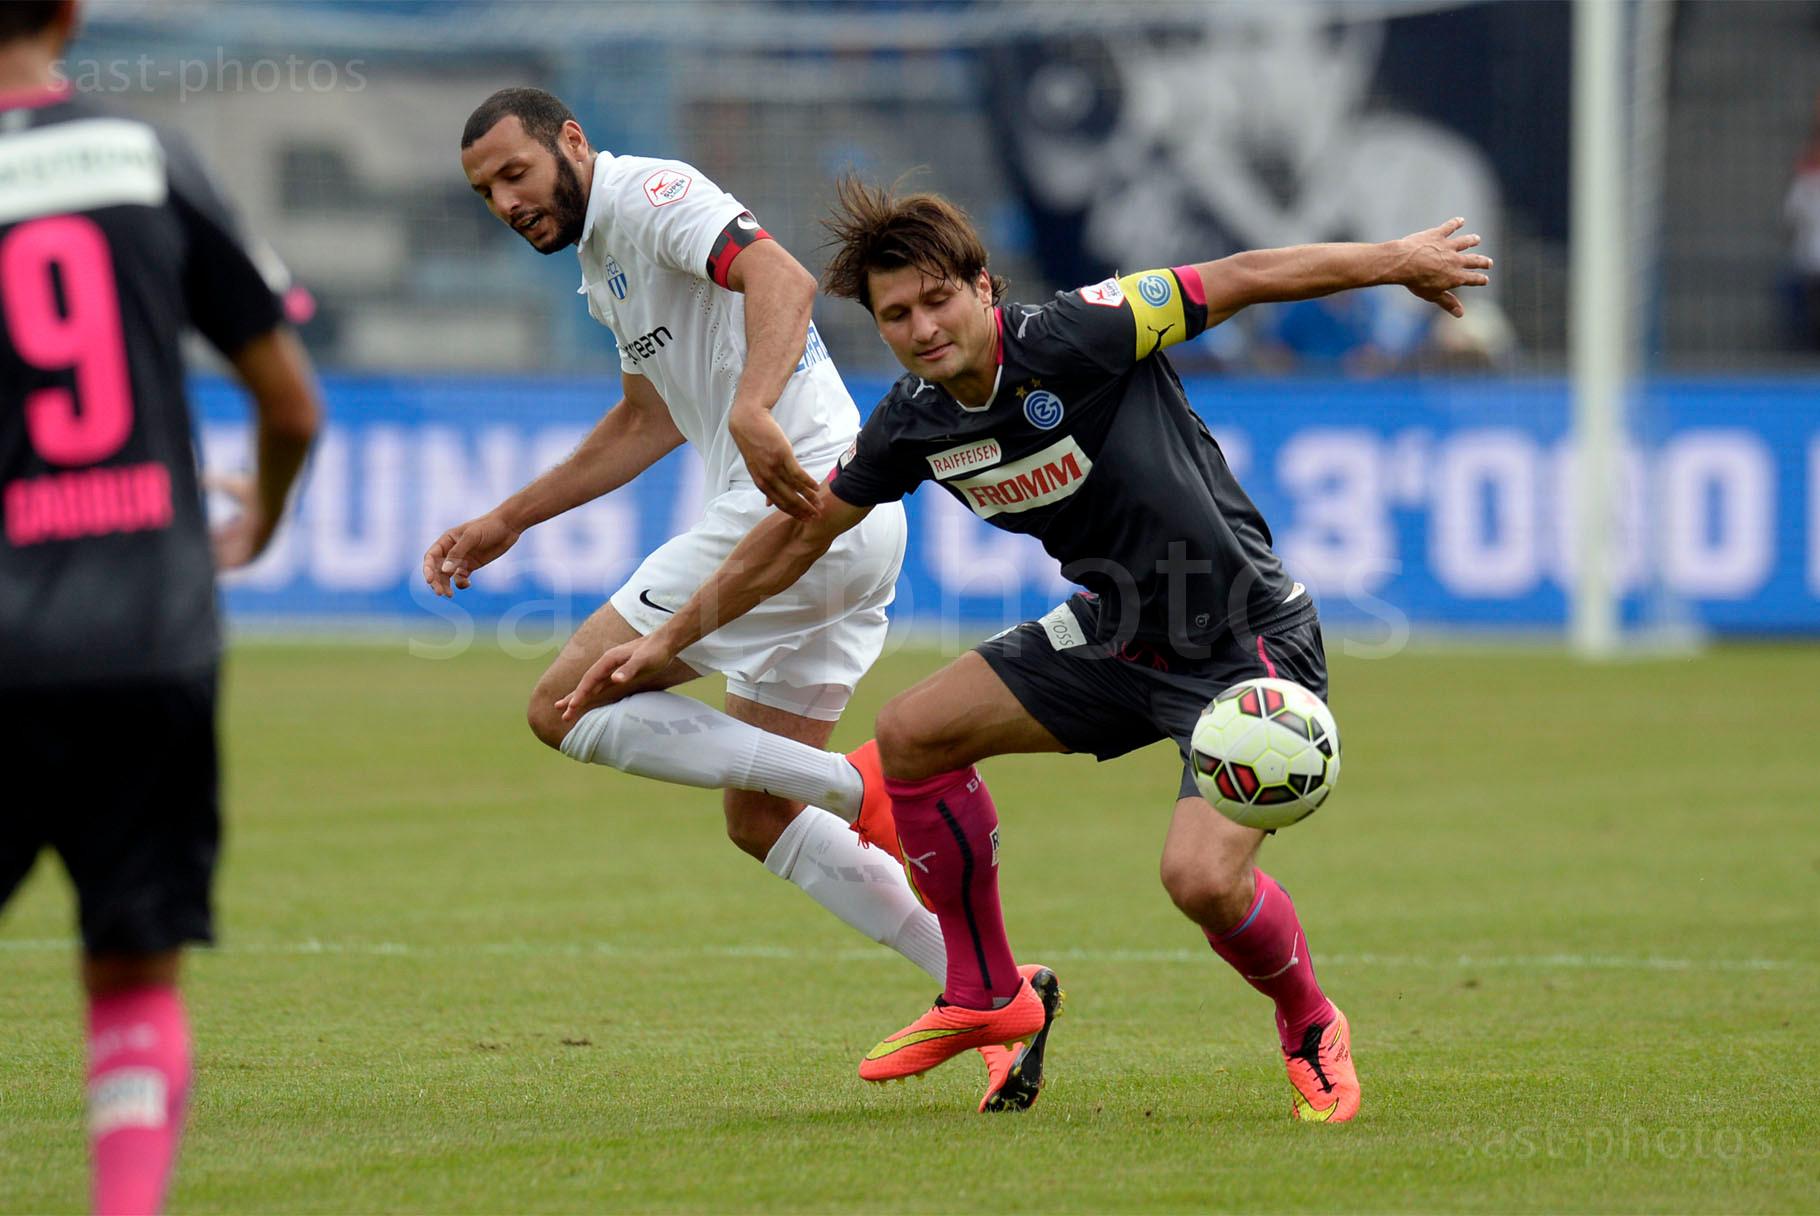 Yassine Chikhaoui (FCZ) gegen Veroljub Salatic (GCZ)